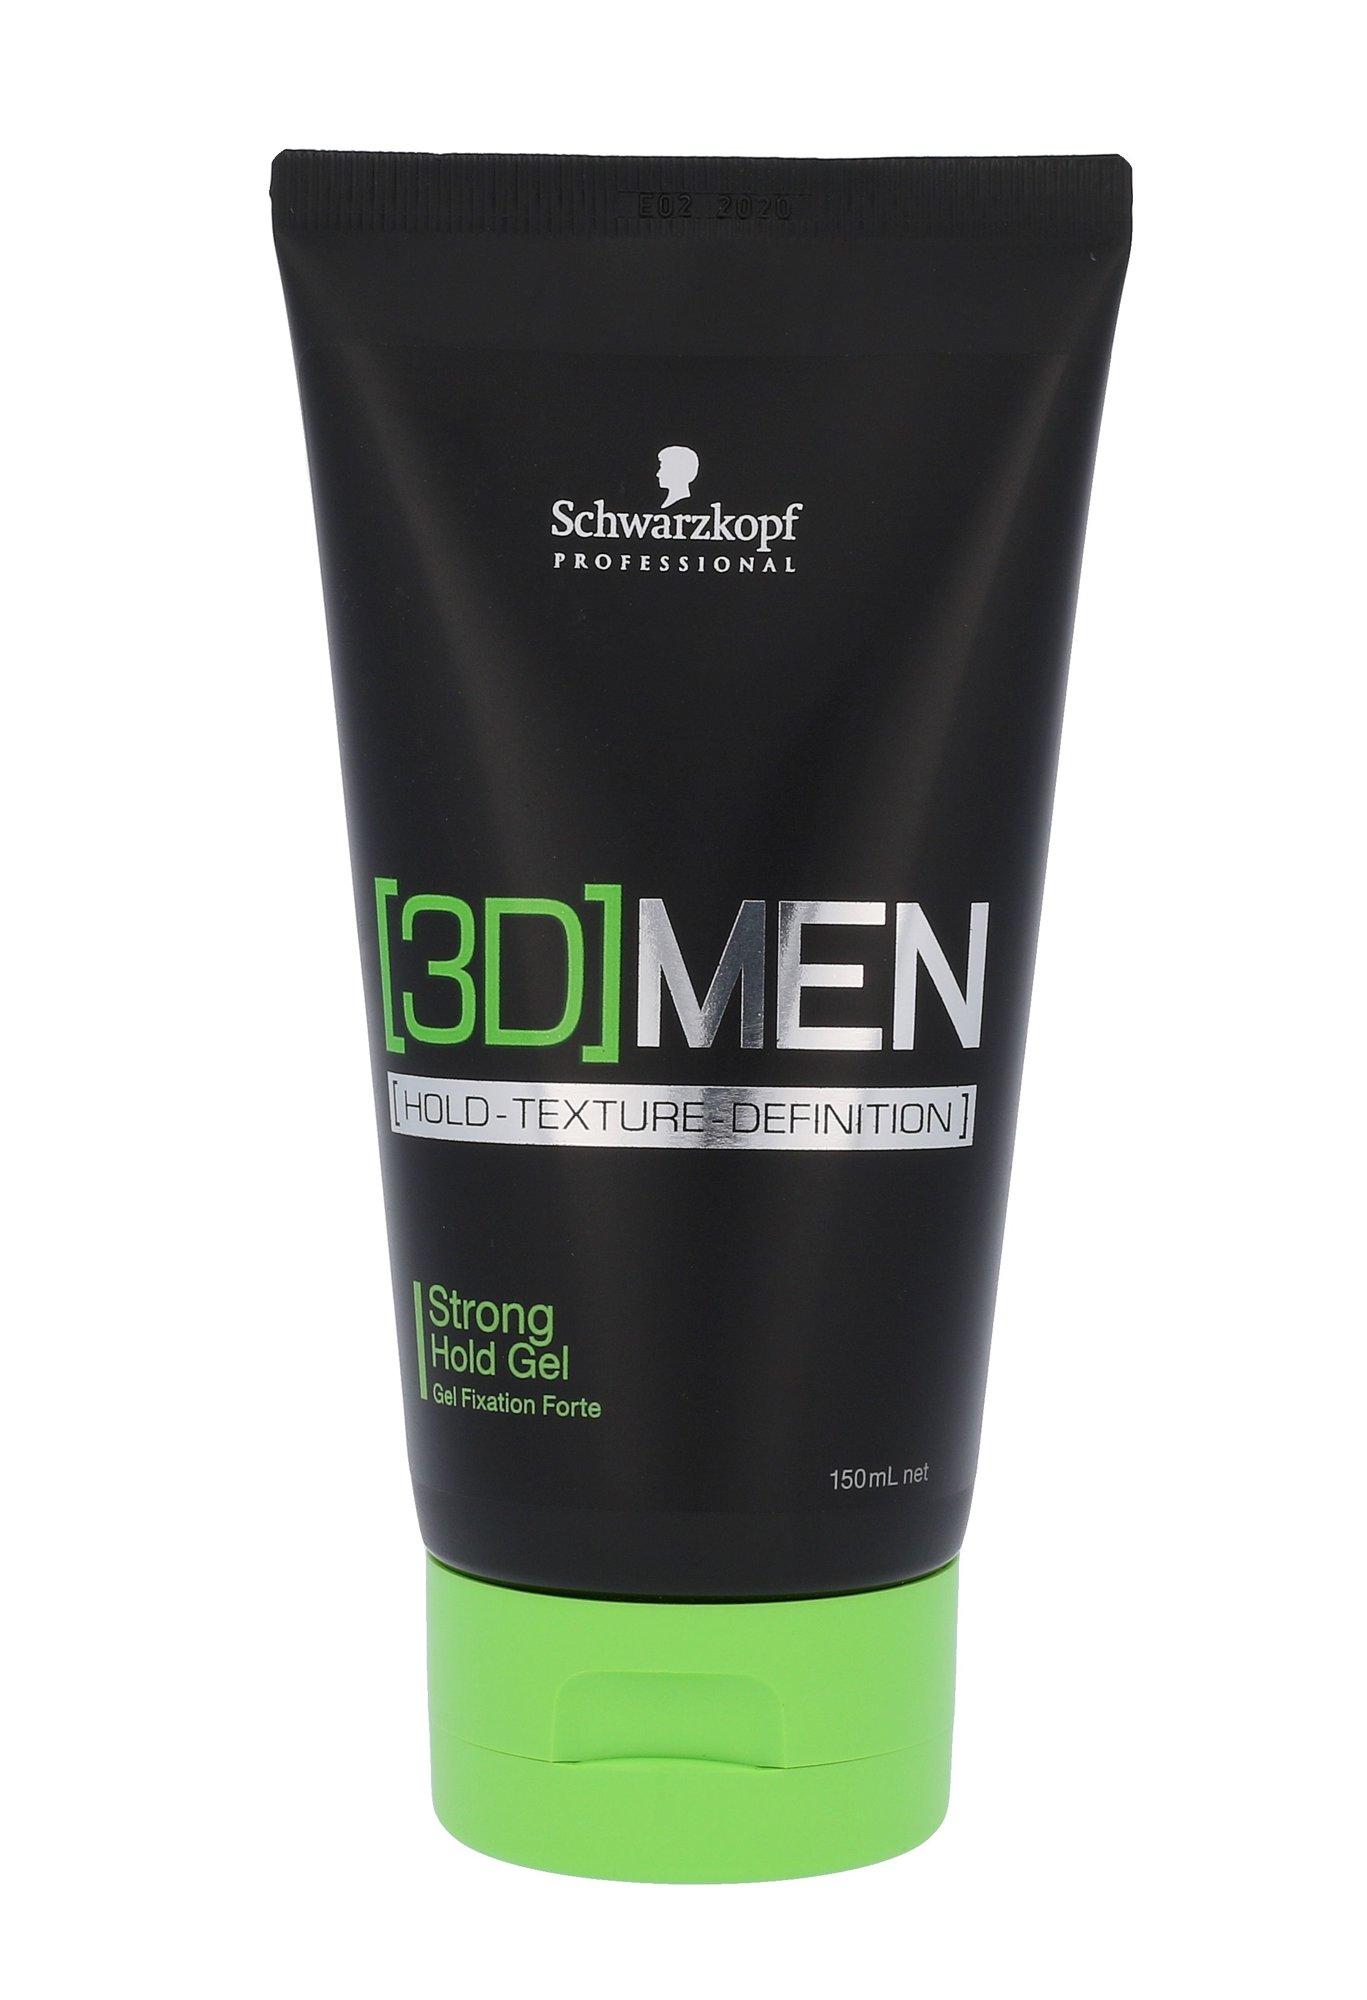 Schwarzkopf Professional 3DMEN Cosmetic 150ml